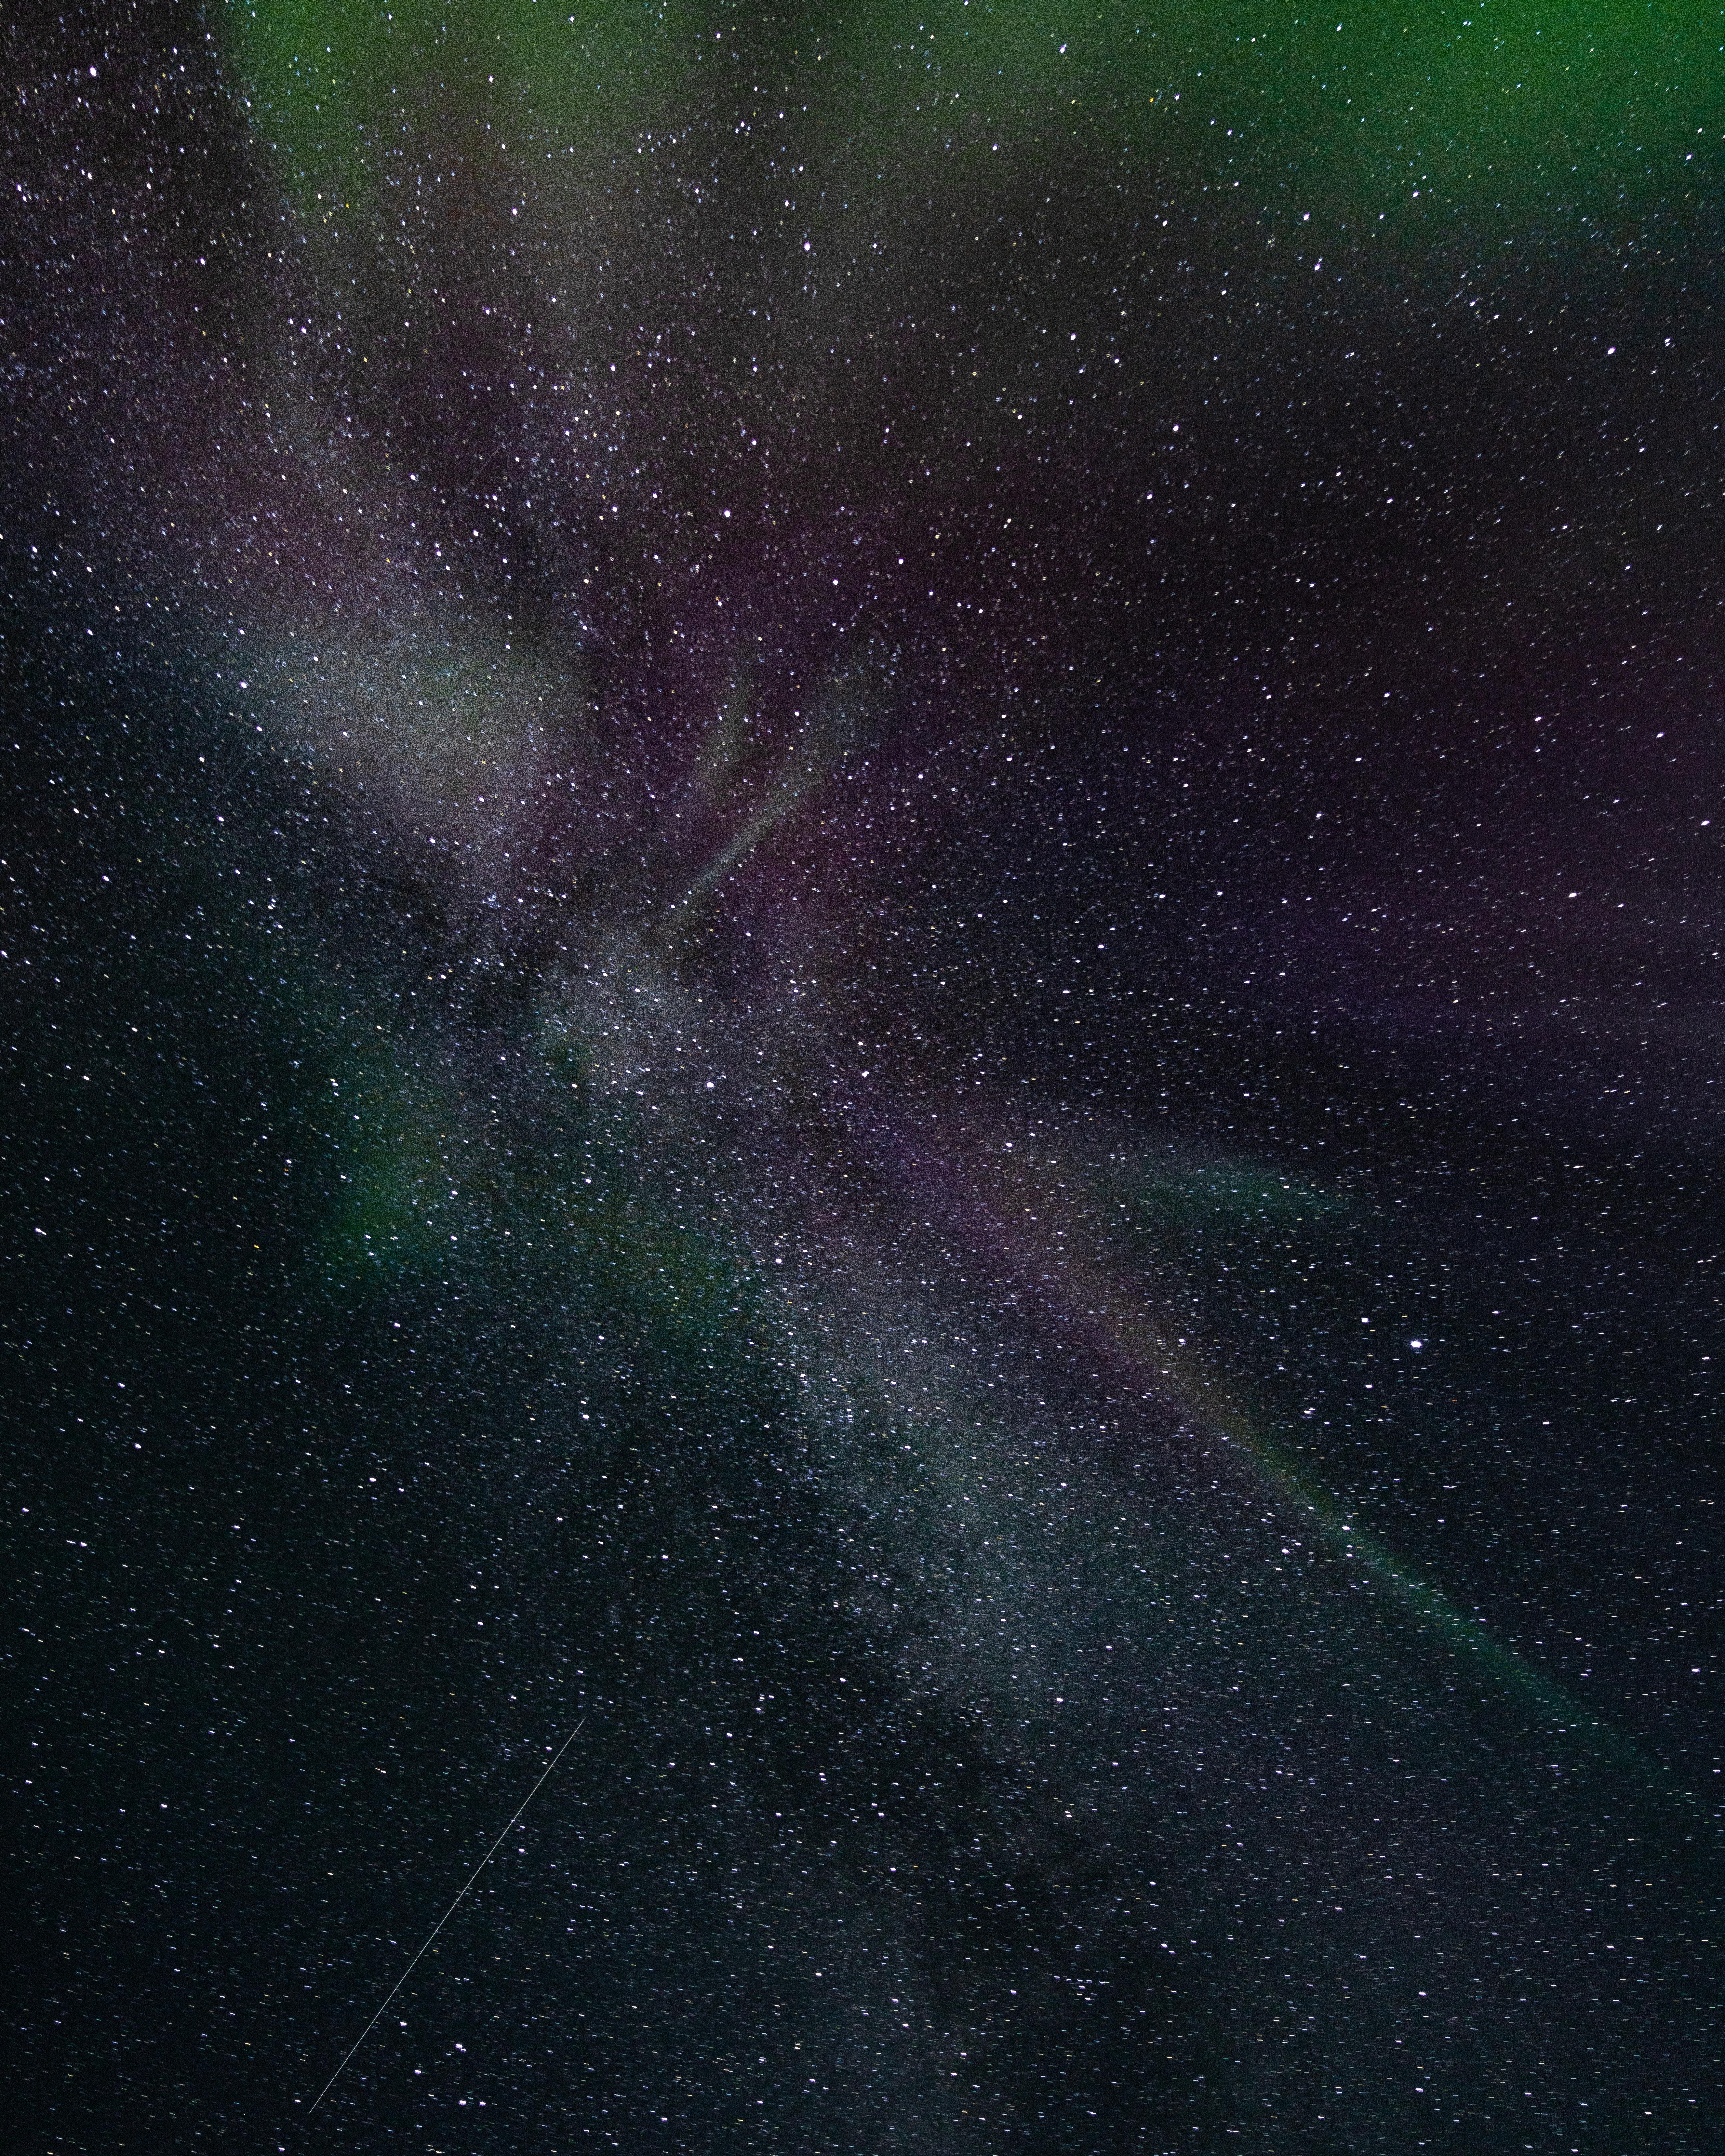 Black And White Galaxy Wallpaper Free Stock Photo